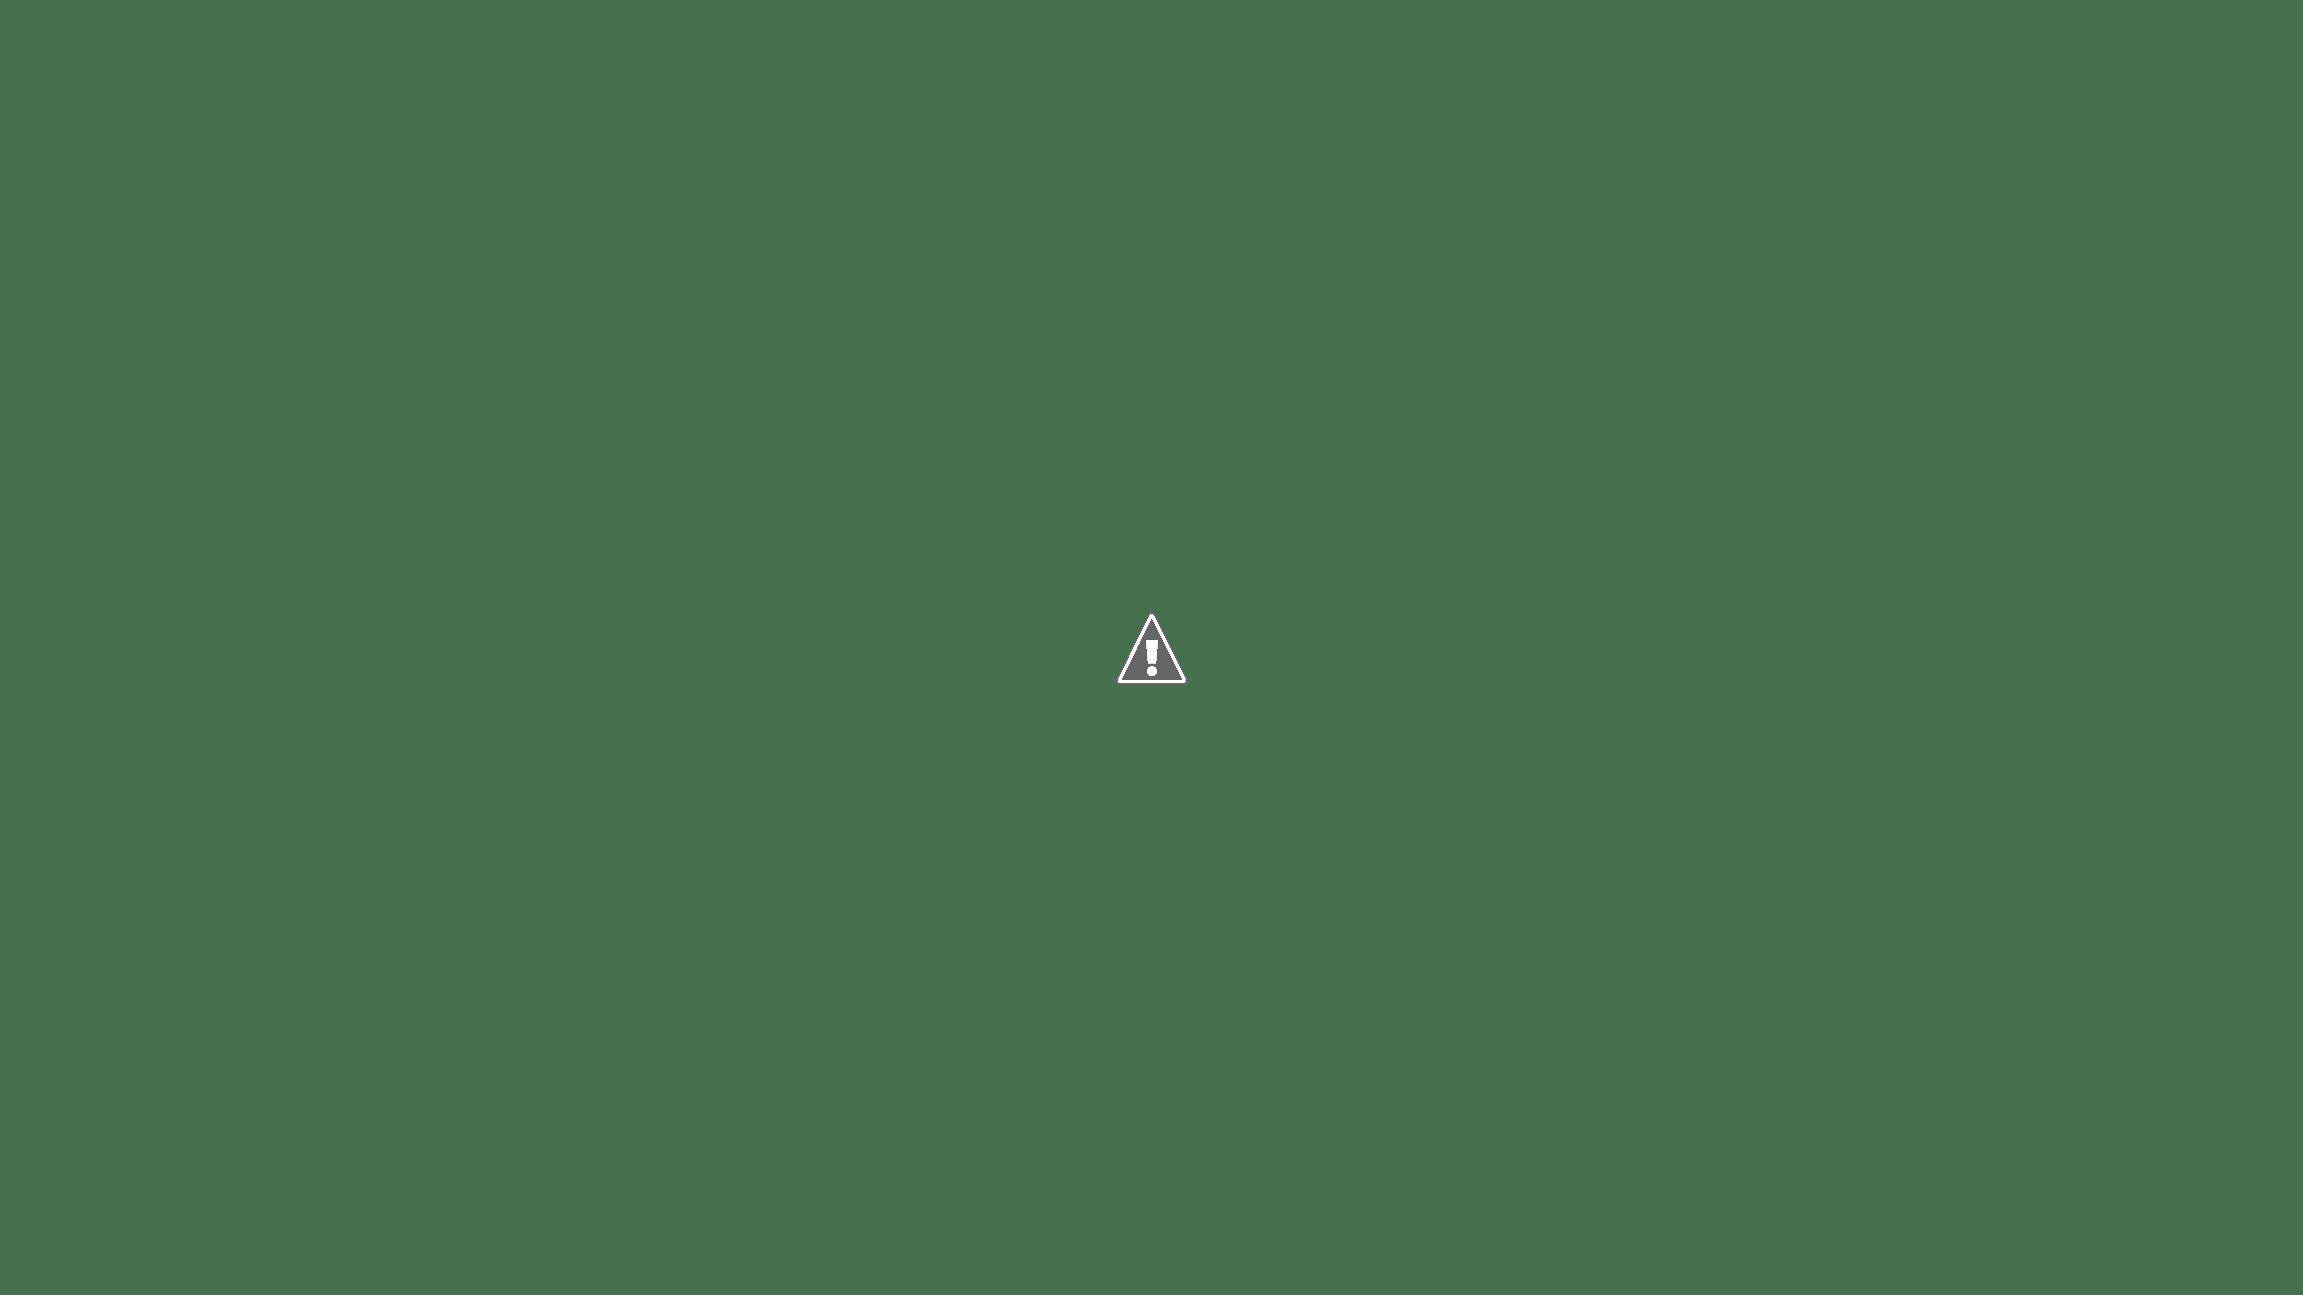 Possible leak source from corner cap/center seam on Coleman